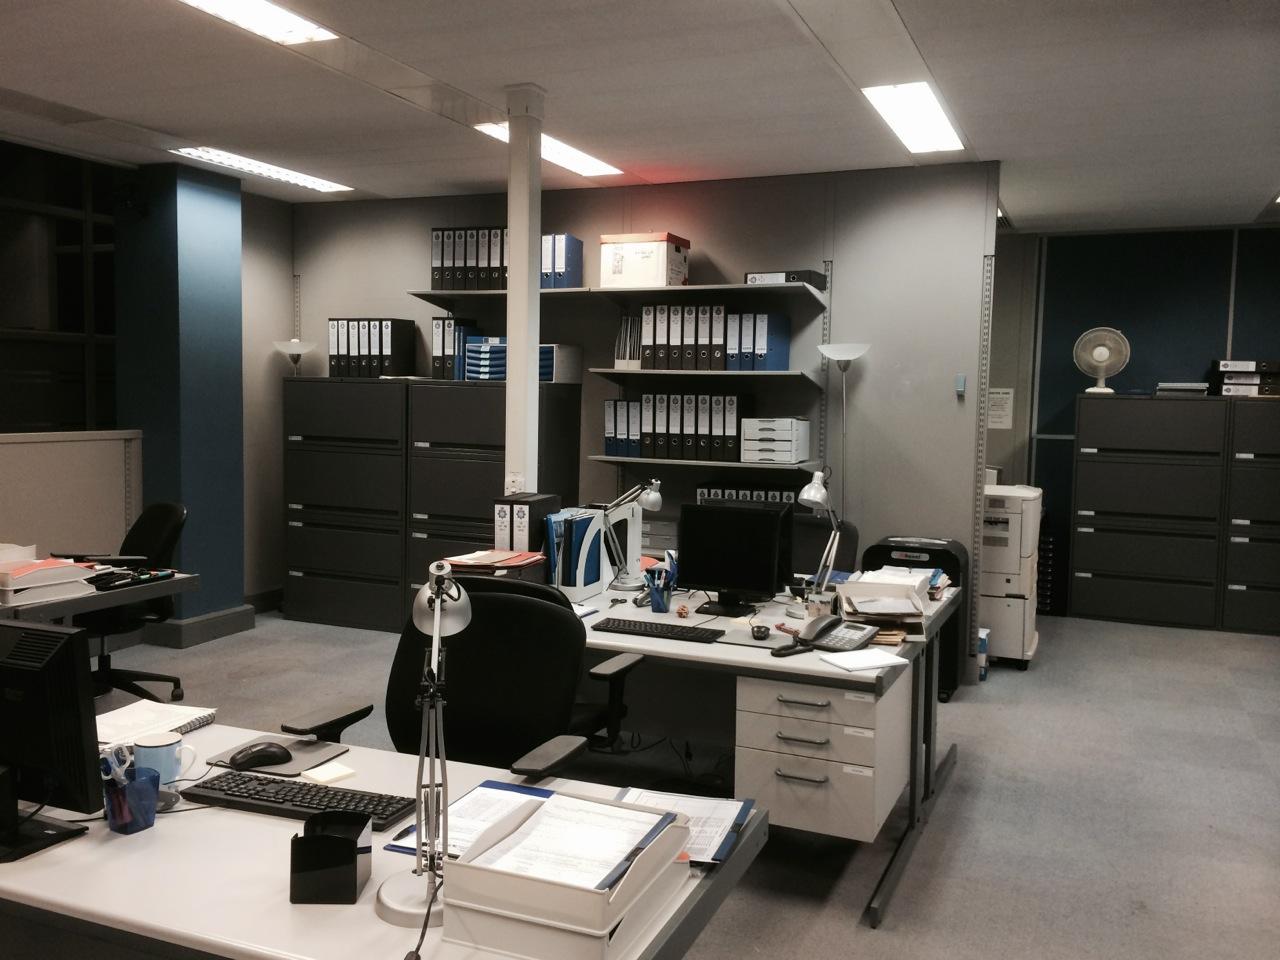 Office interior design interior design services park for Design services london